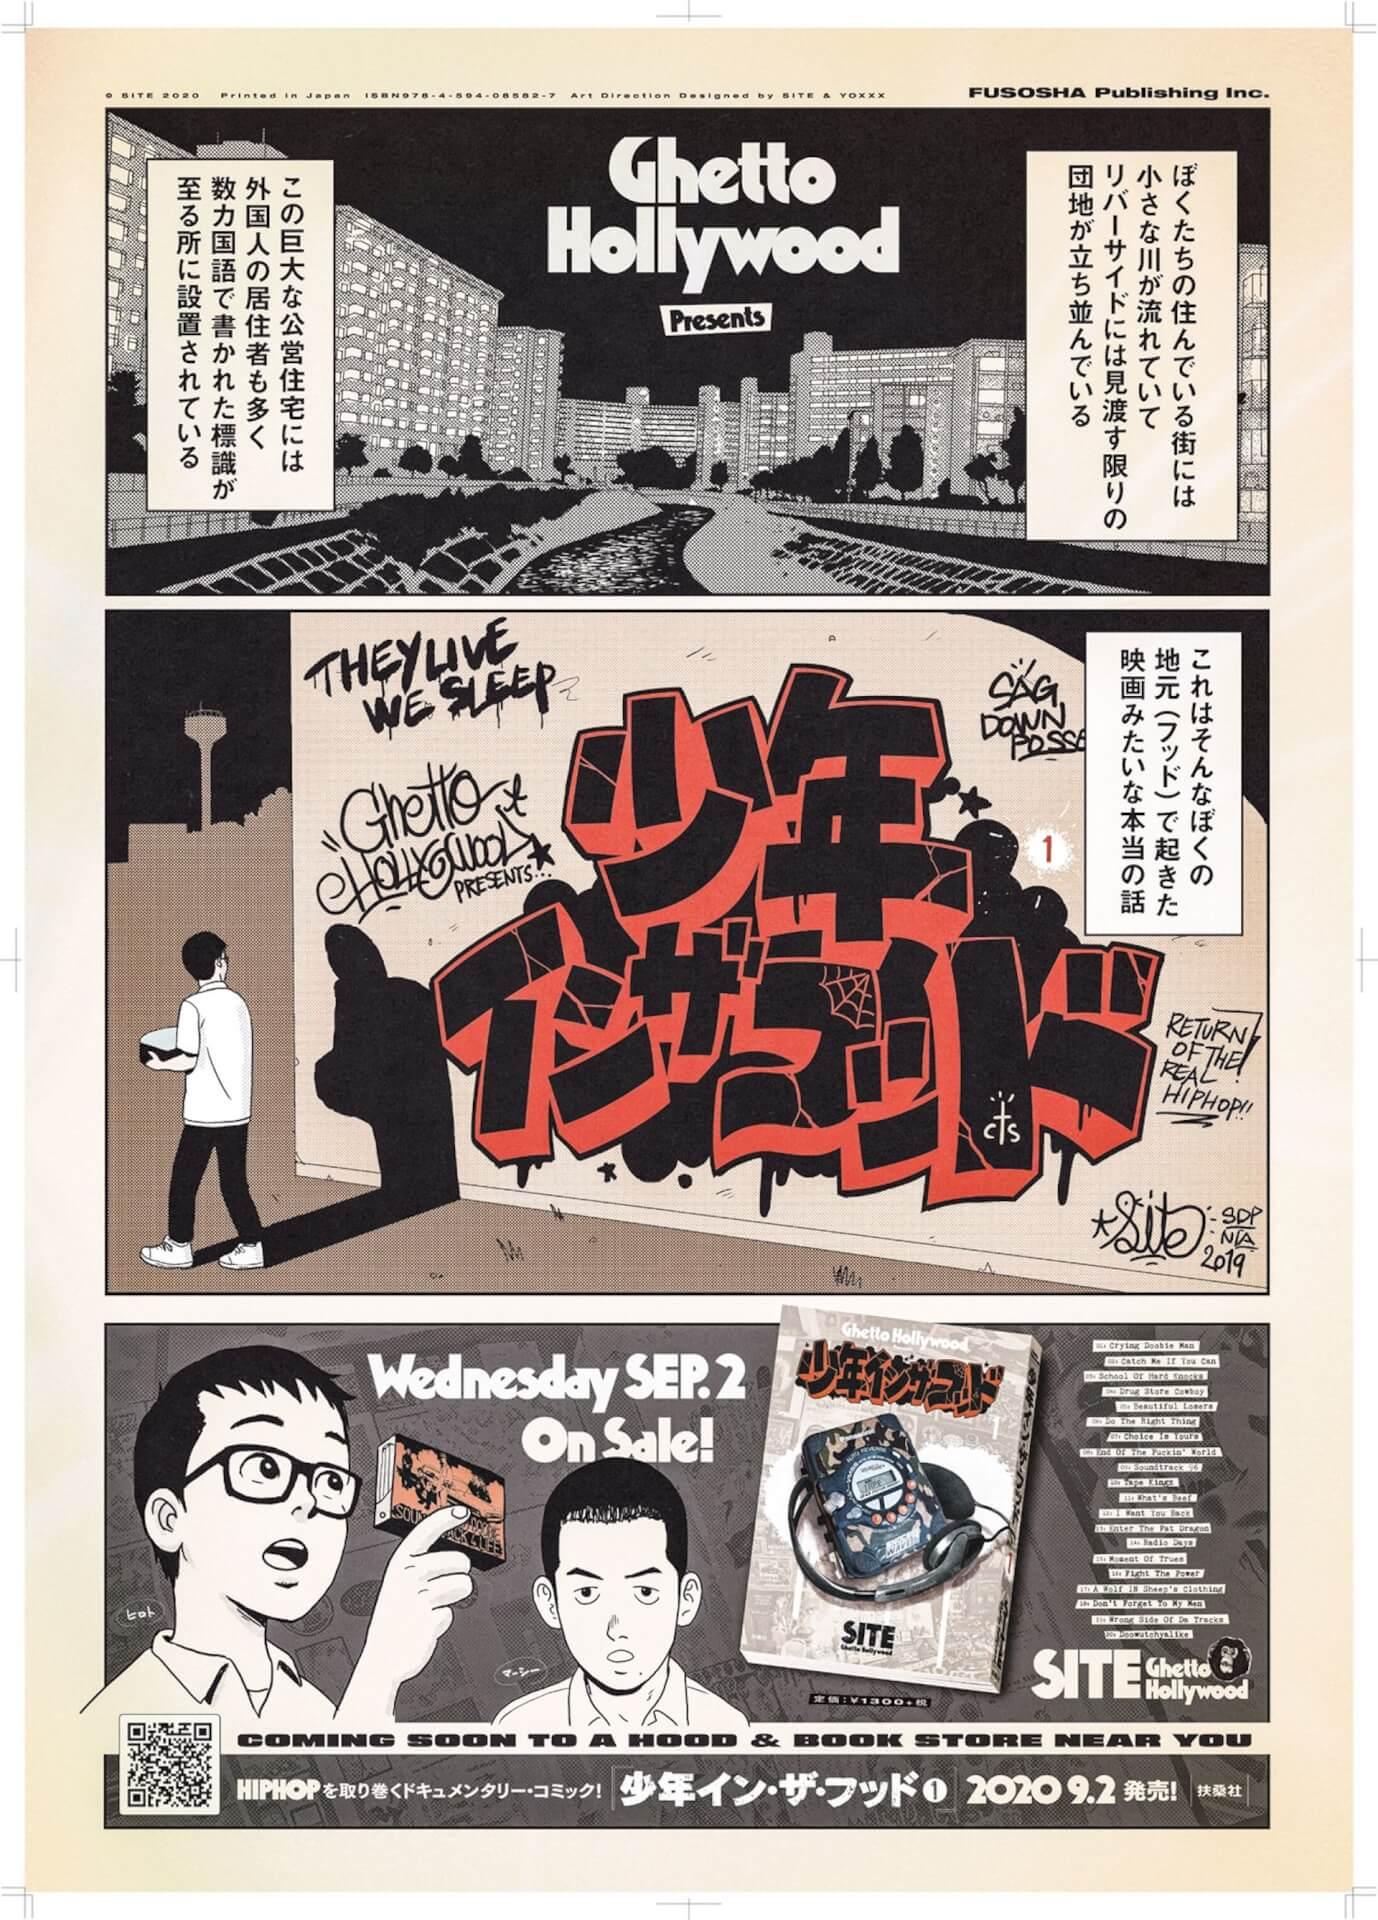 Ghetto Hollywoodのマンガ家デビュー作『少年イン・ザ・フッド』第1巻が重版決定!特別記念グラフィックが完成&スペシャルメッセージも art200919_shoneninthehood_2